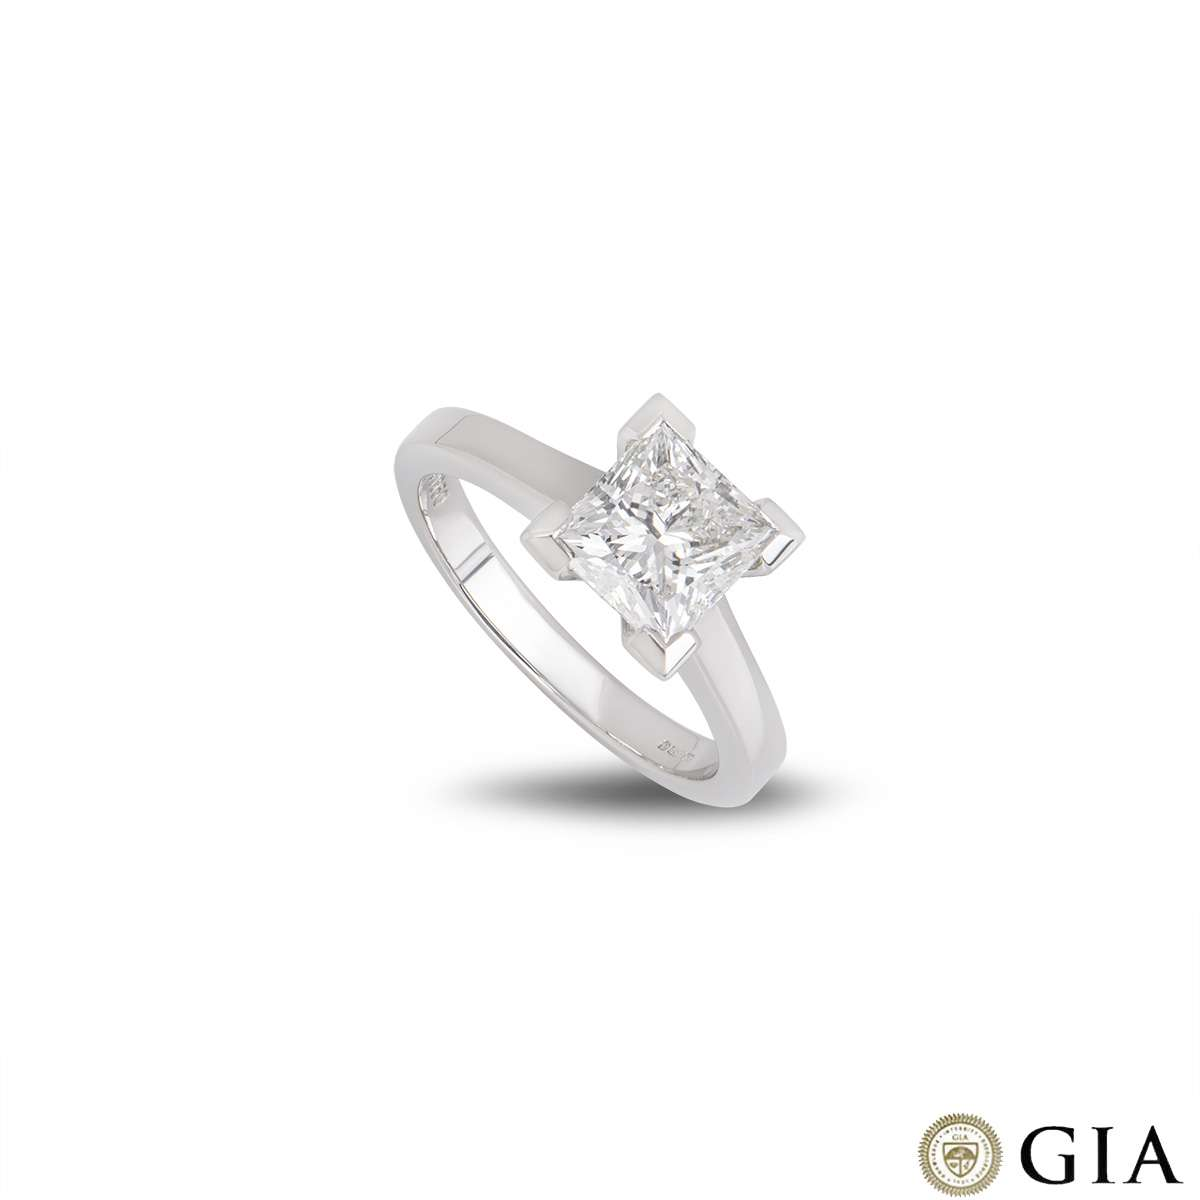 18k White Gold Diamond Princess Cut Diamond Ring 2.01ct G/VS1